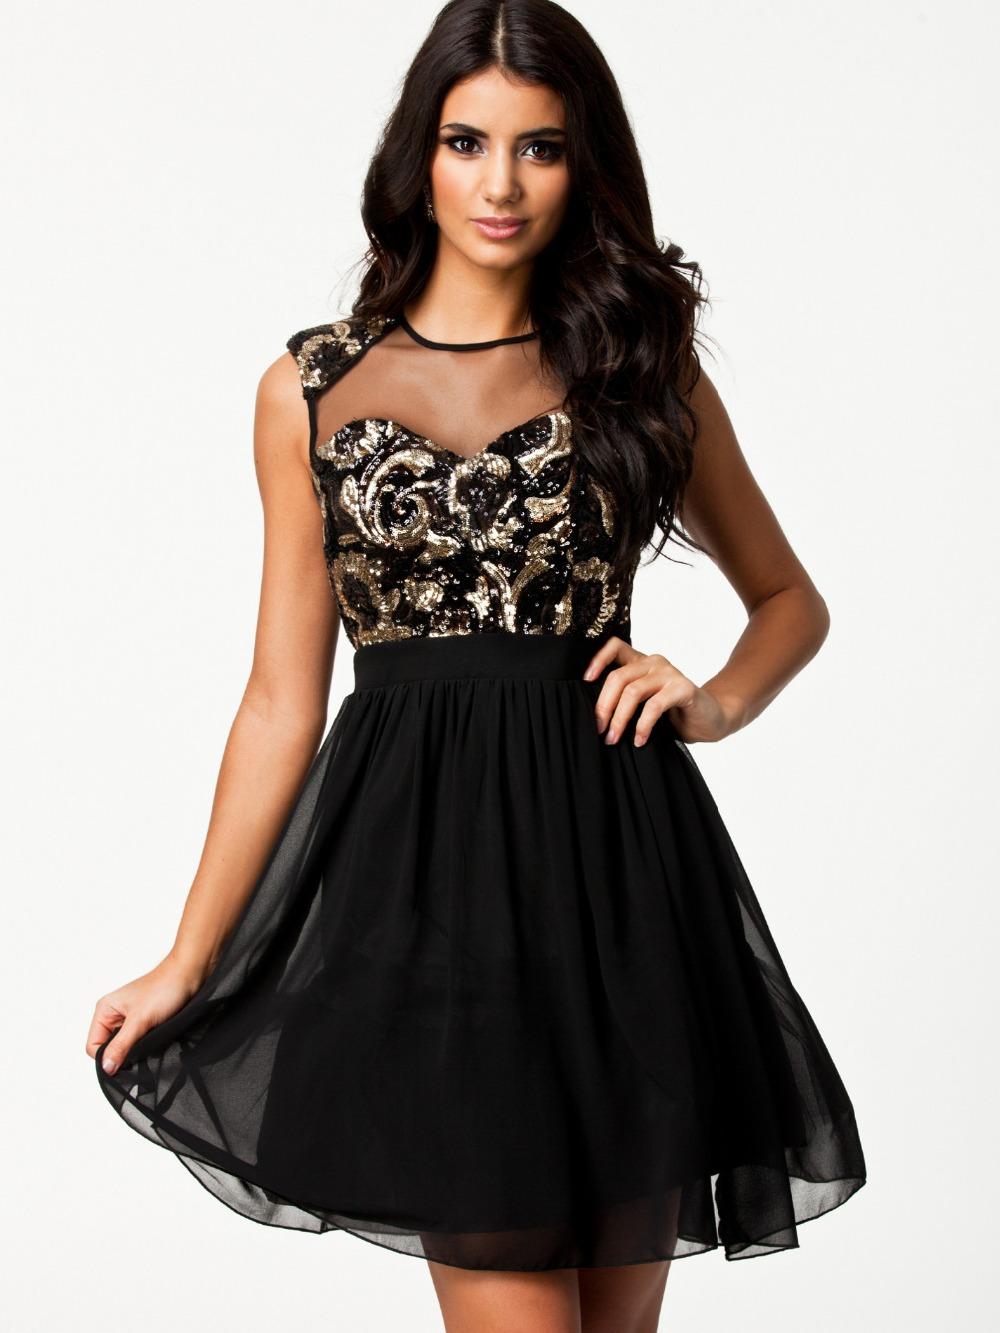 Classy Party Dresses | Dress images